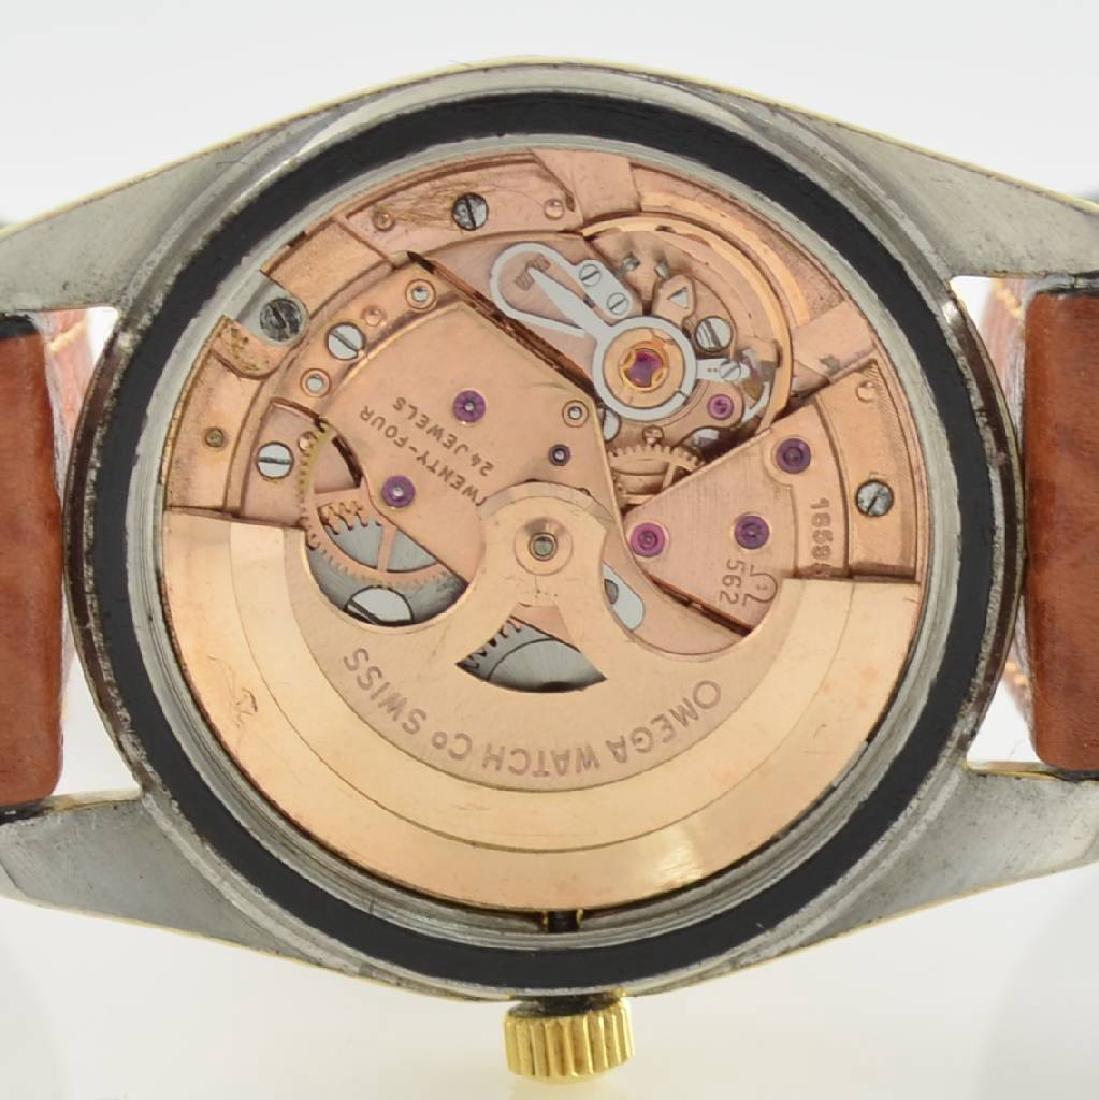 OMEGA self winding gents wristwatch model Seamaster - 5